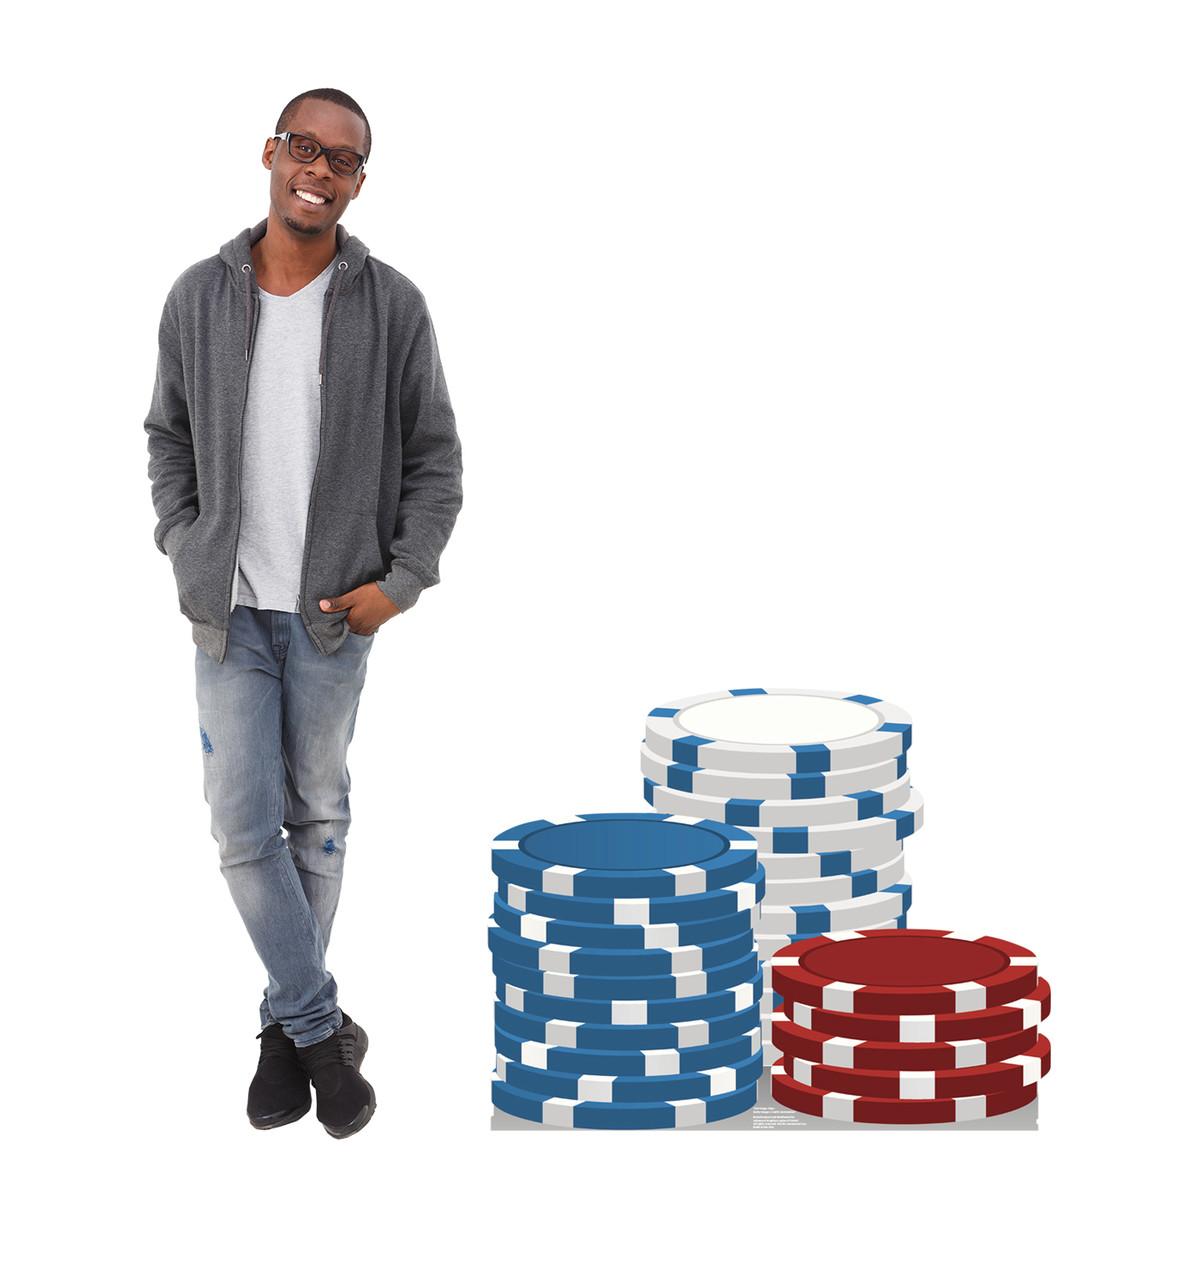 Vegas Chips - Cardboard Cutout 1844